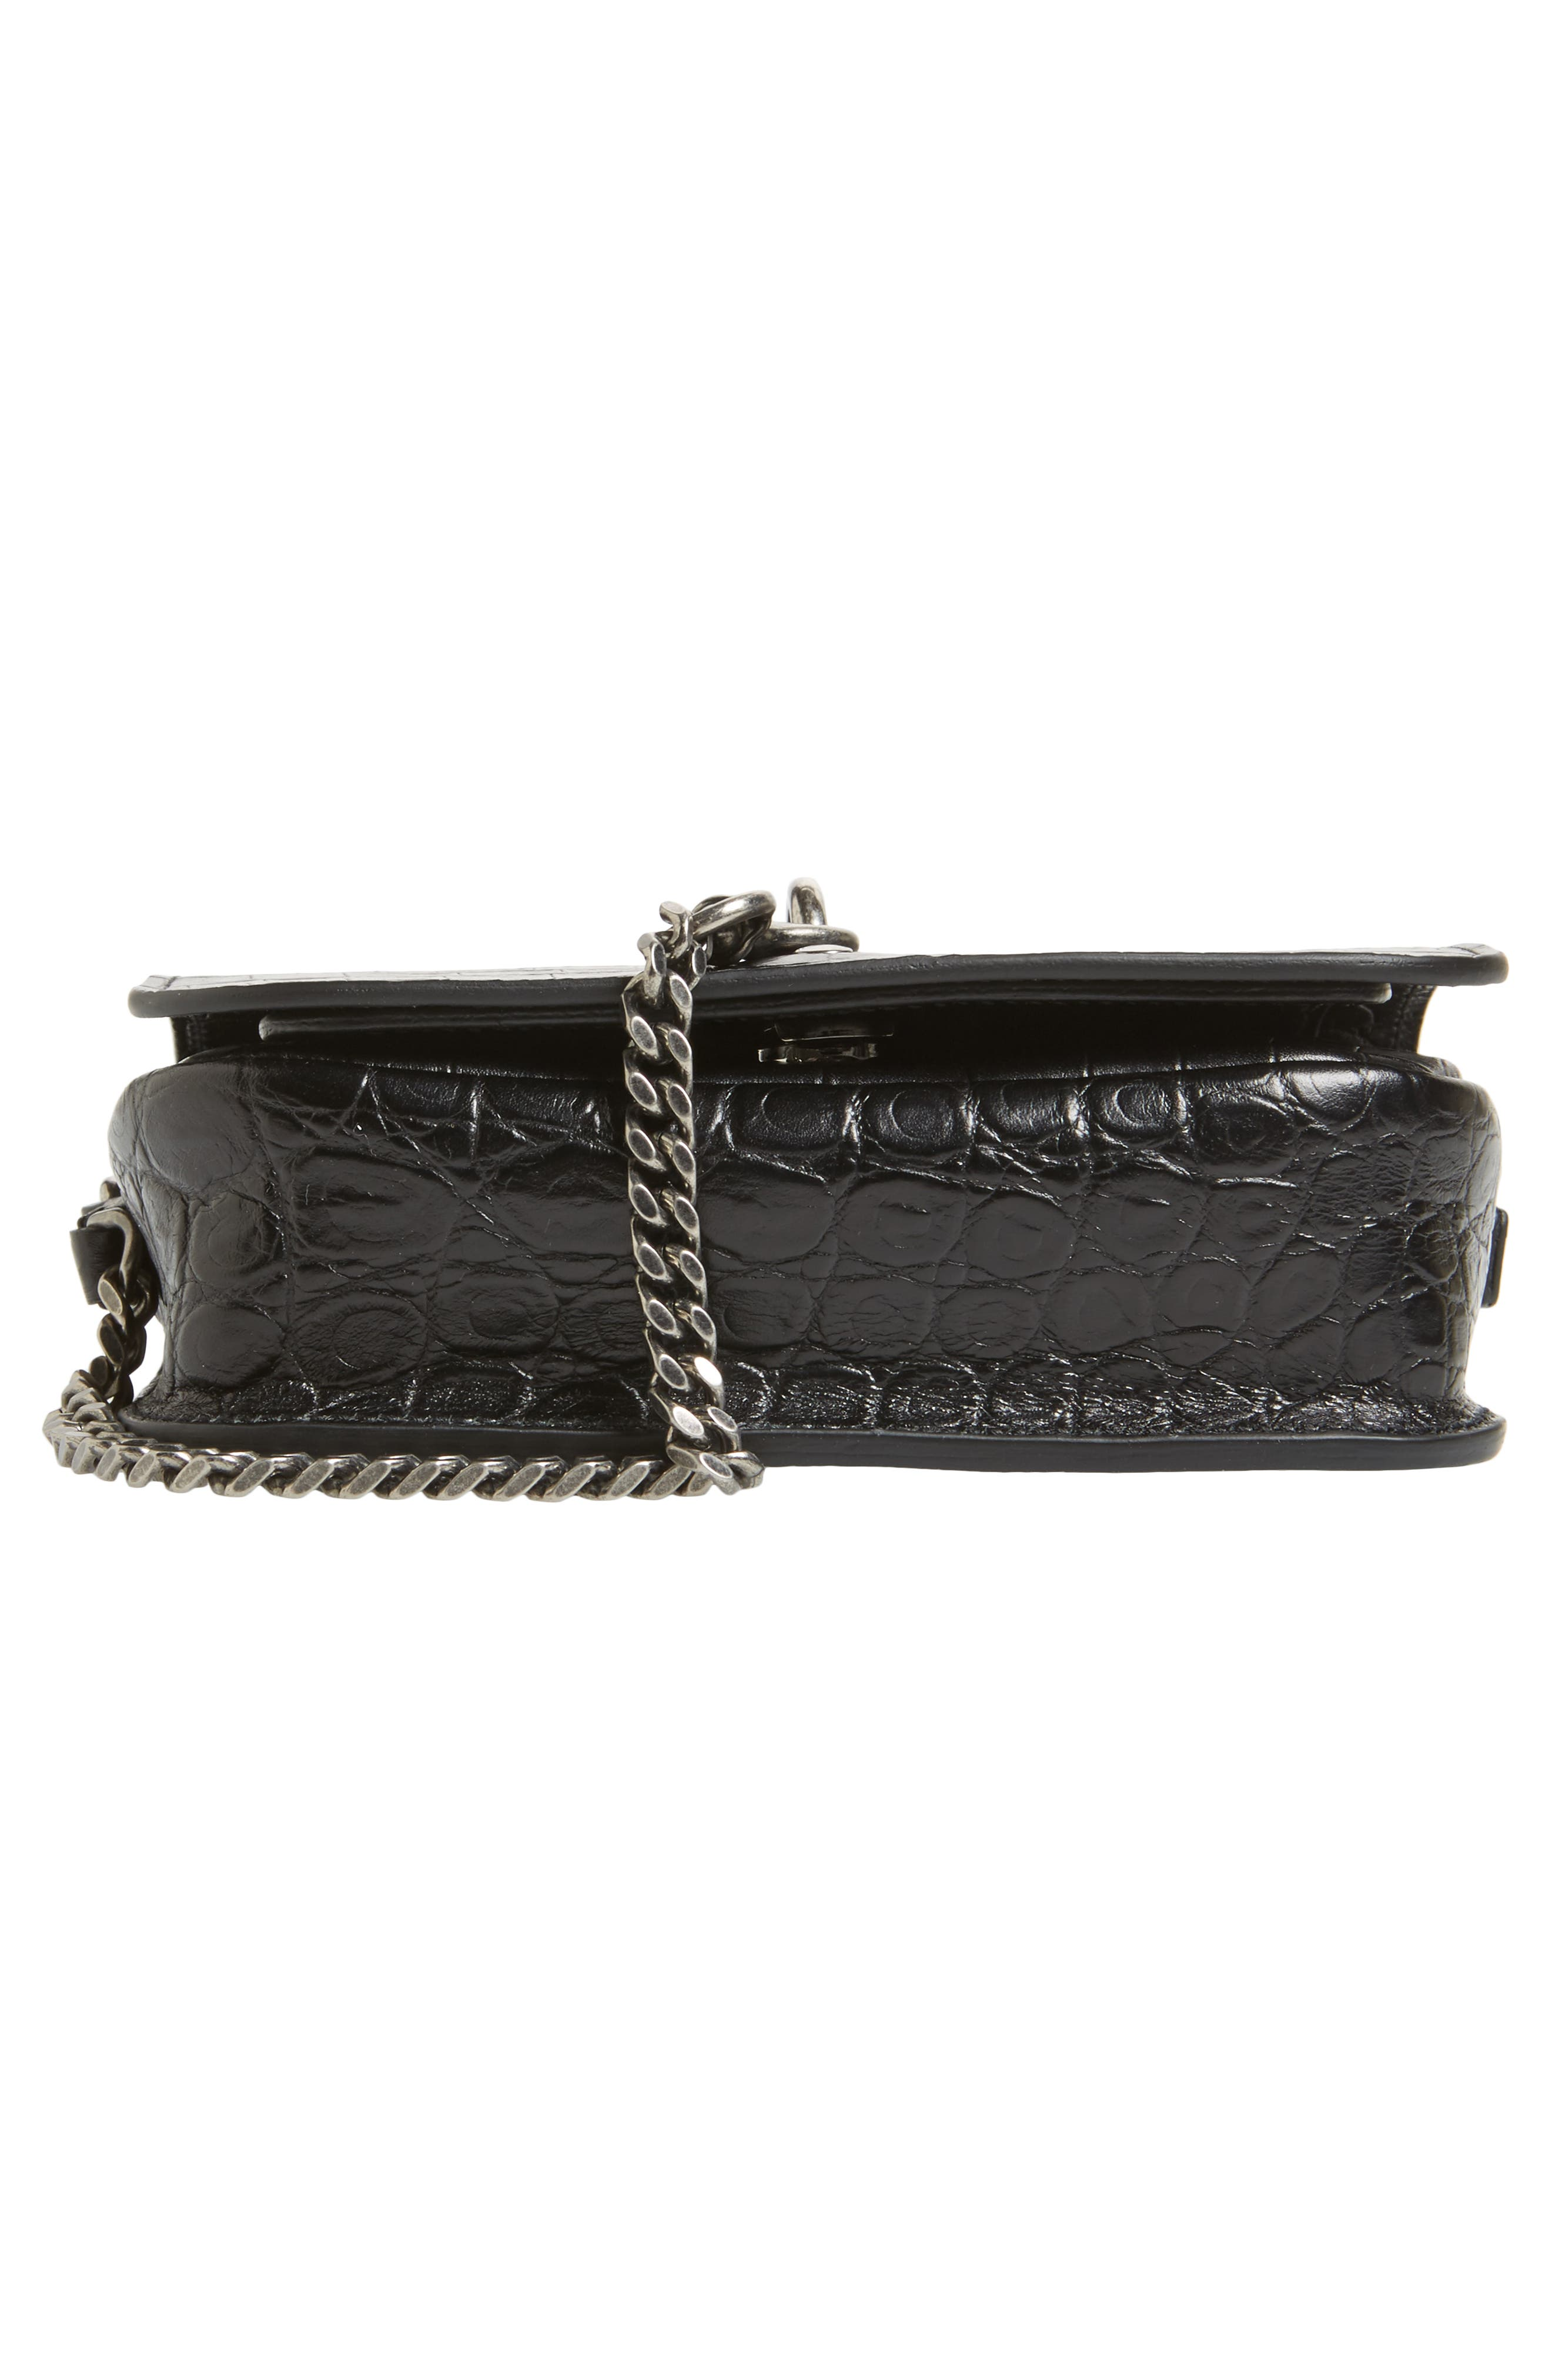 Croc Embossed Leather Crossbody Bag,                             Alternate thumbnail 6, color,                             Noir